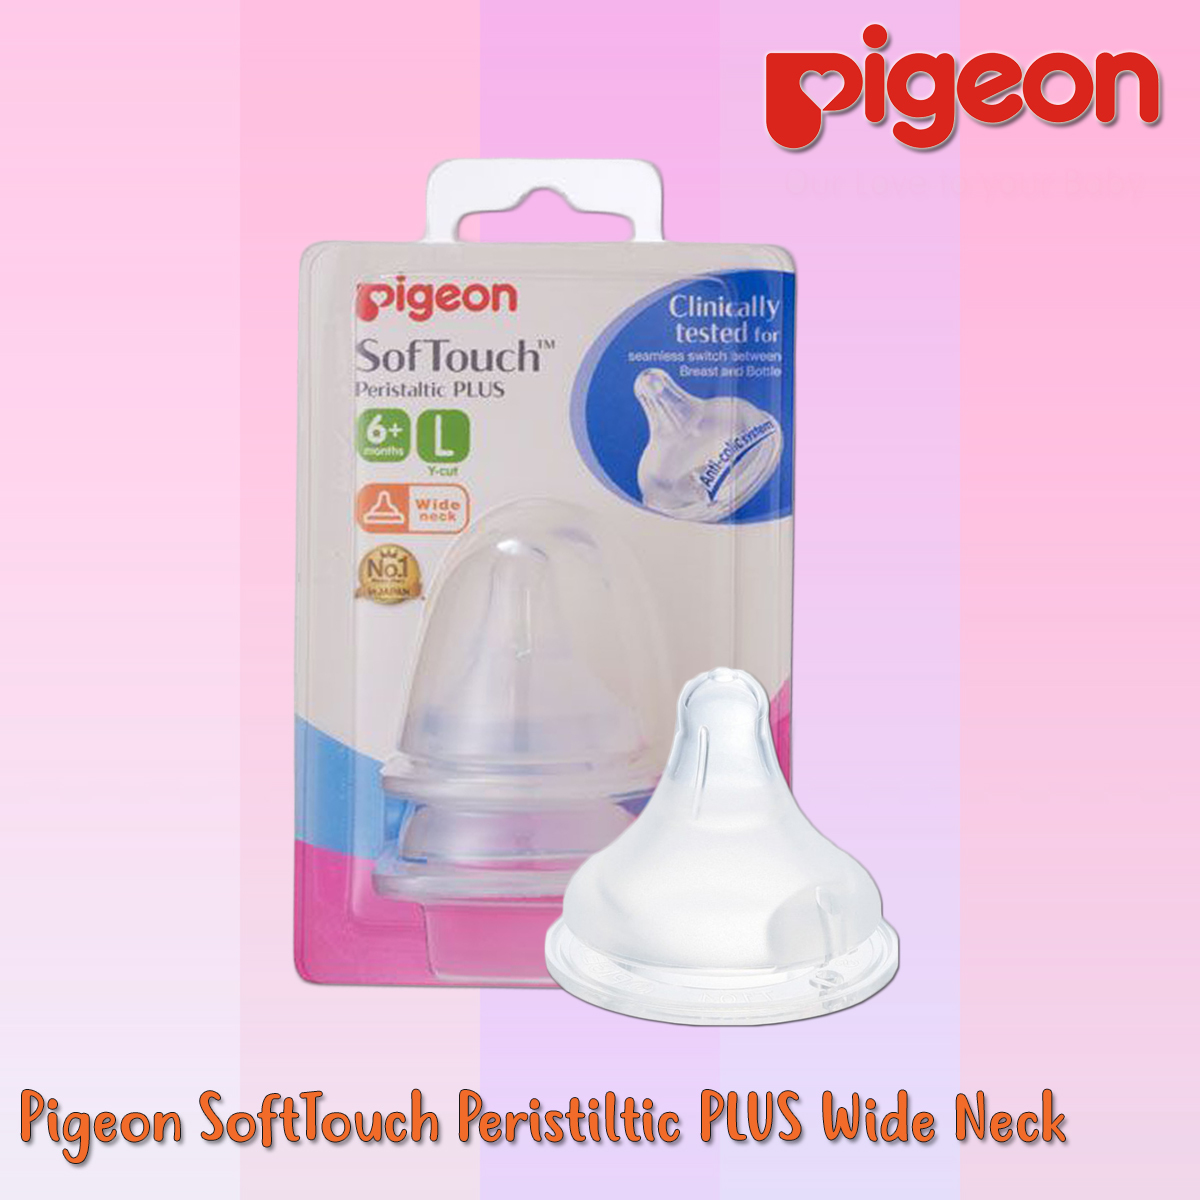 Pigeon SoftTouch Peristiltic PLUS Wide Neck.jpg